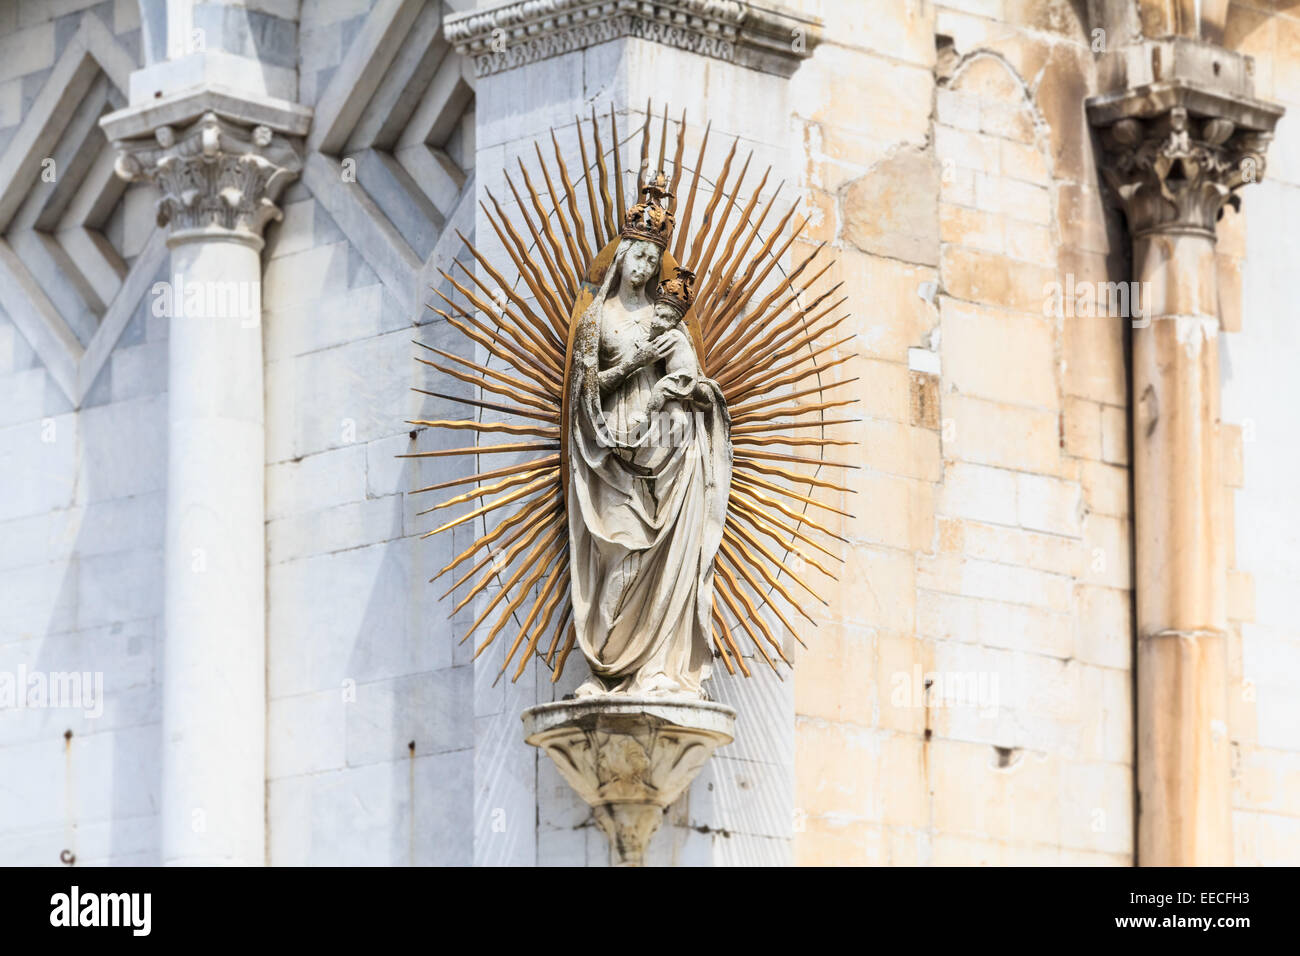 Madonna / Maria-Skulptur mit Aureola an der Fassade des Luccas Kuppel namens San Michele in Foro, Italien Stockbild